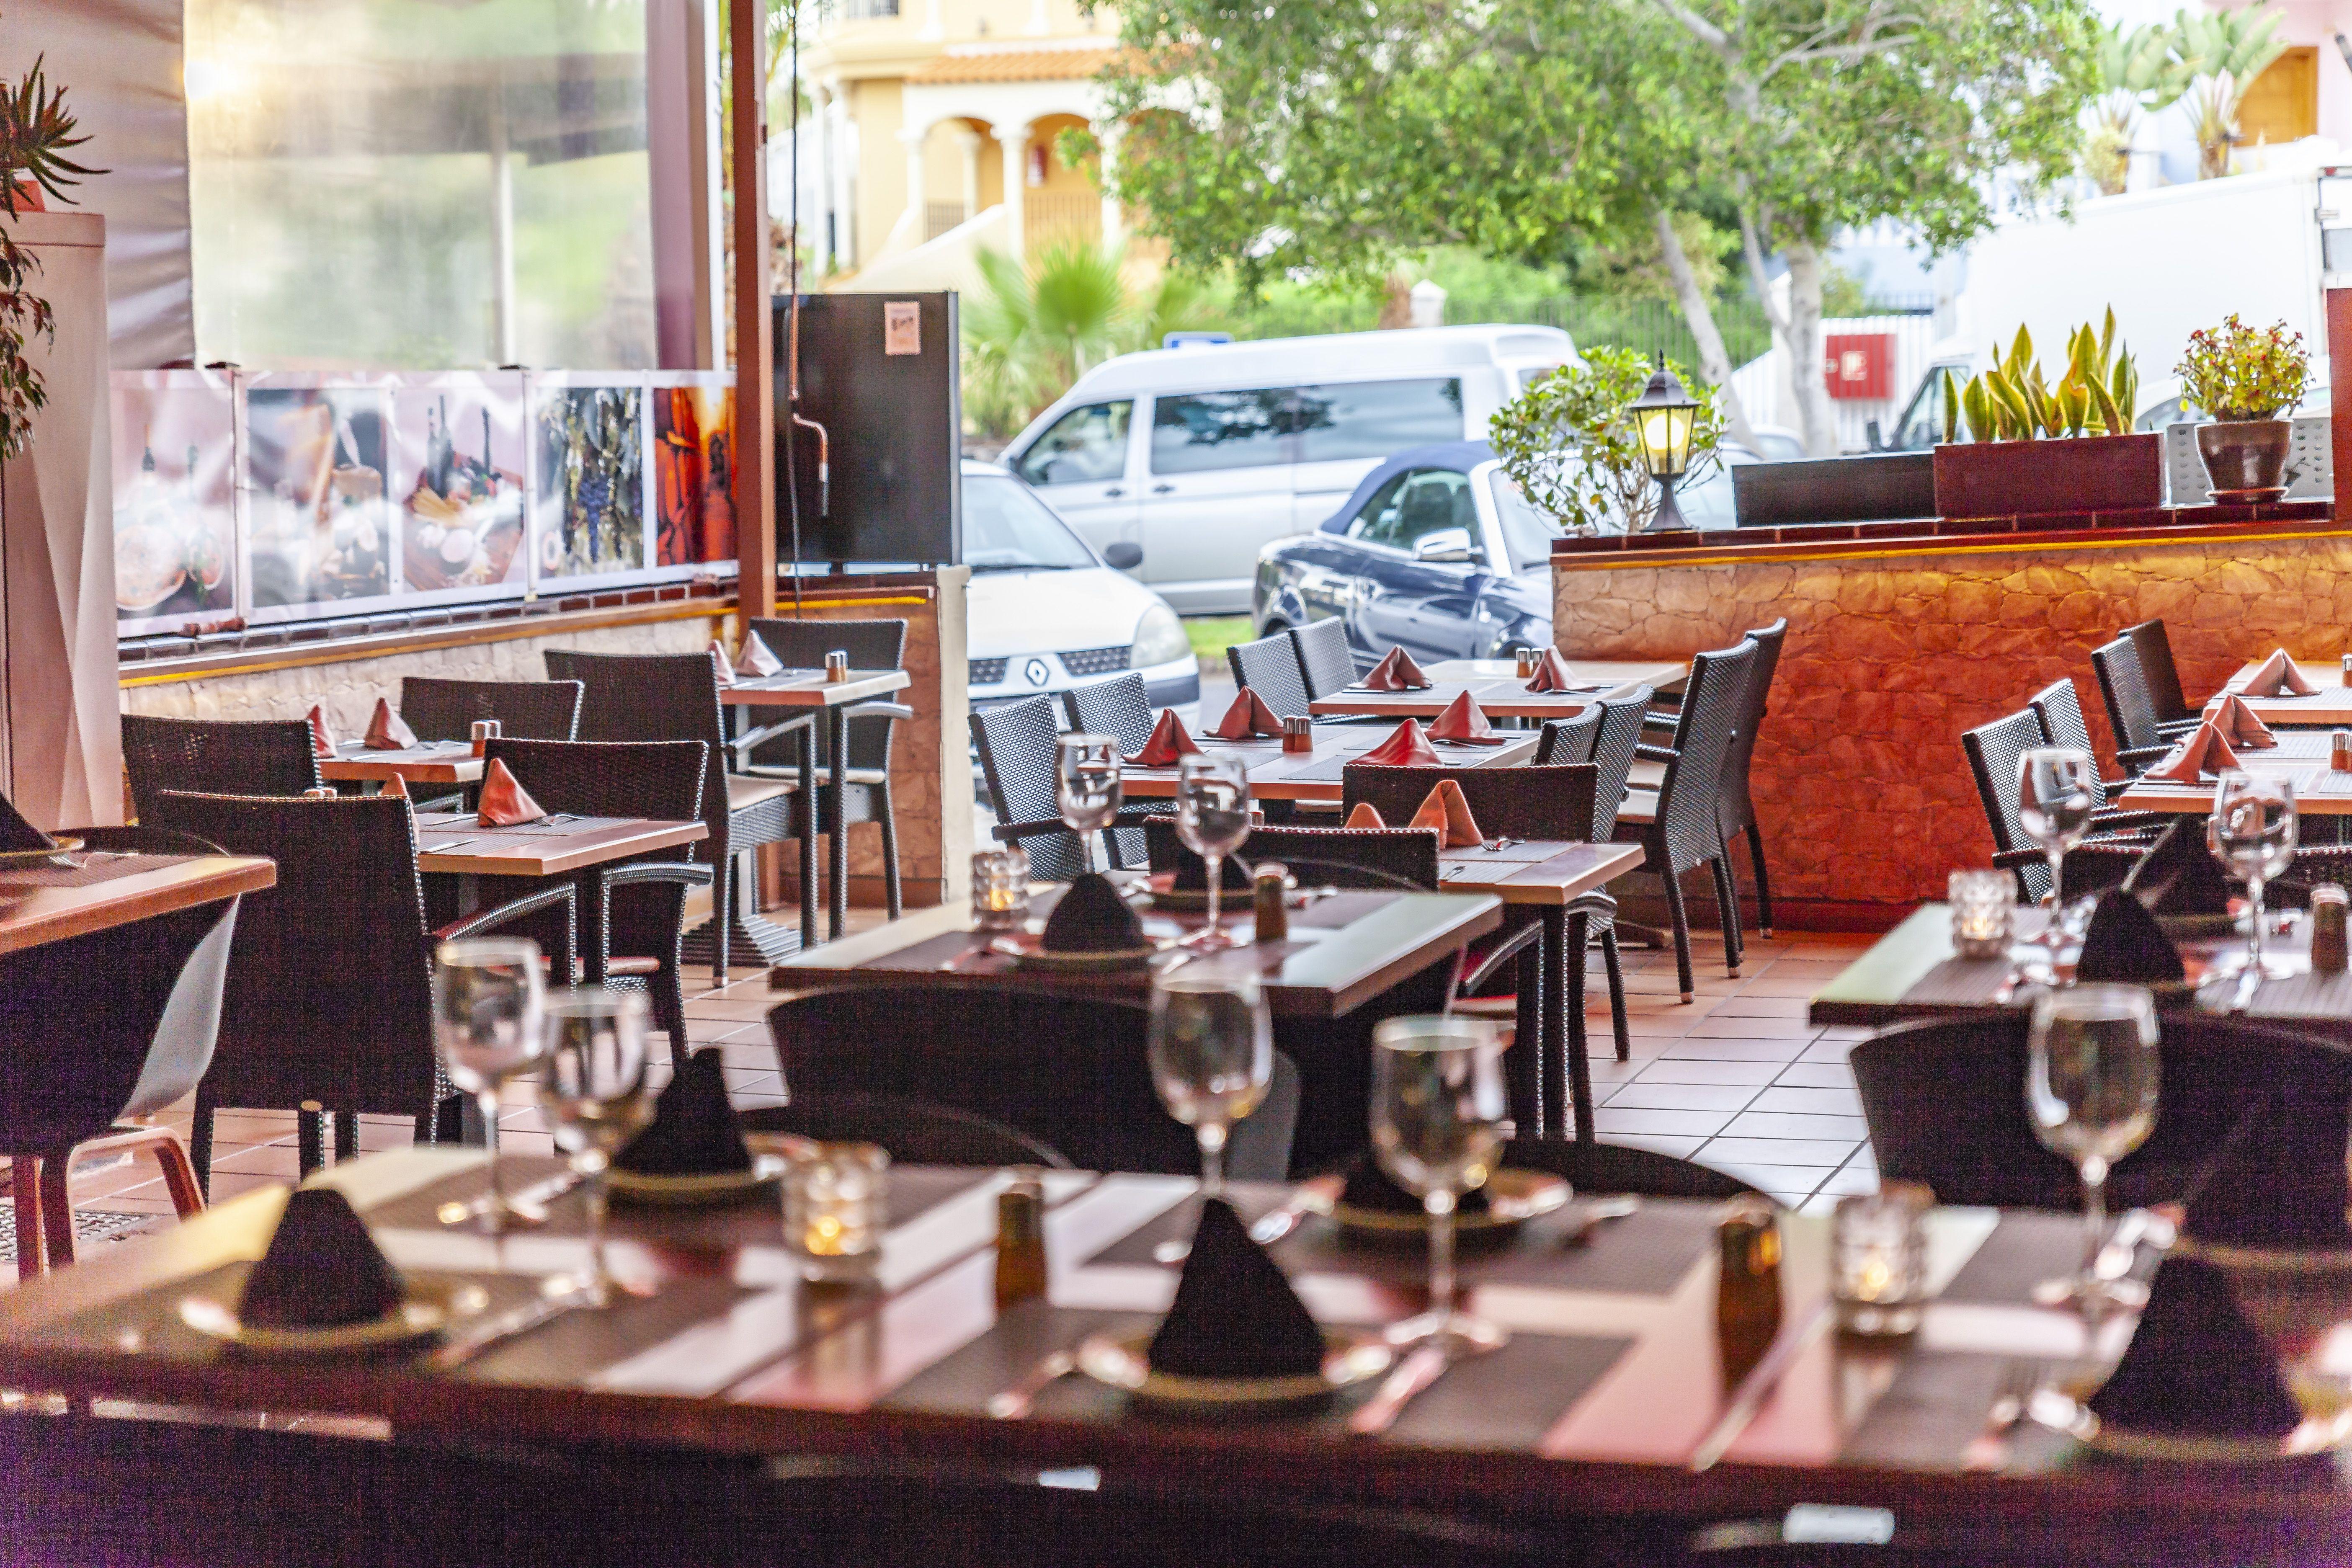 Foto 23 de Restaurante en Arona | Restaurante Locanda Italiana